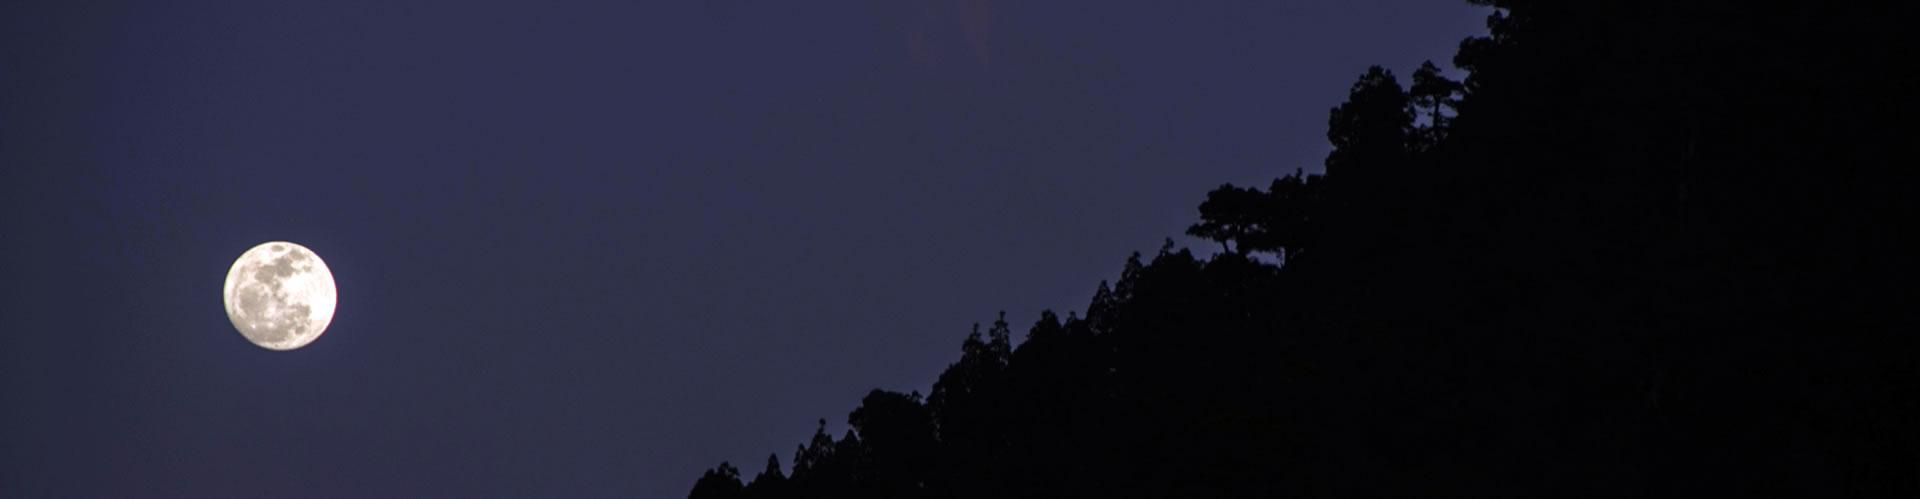 Luna en Garafia, La Palma